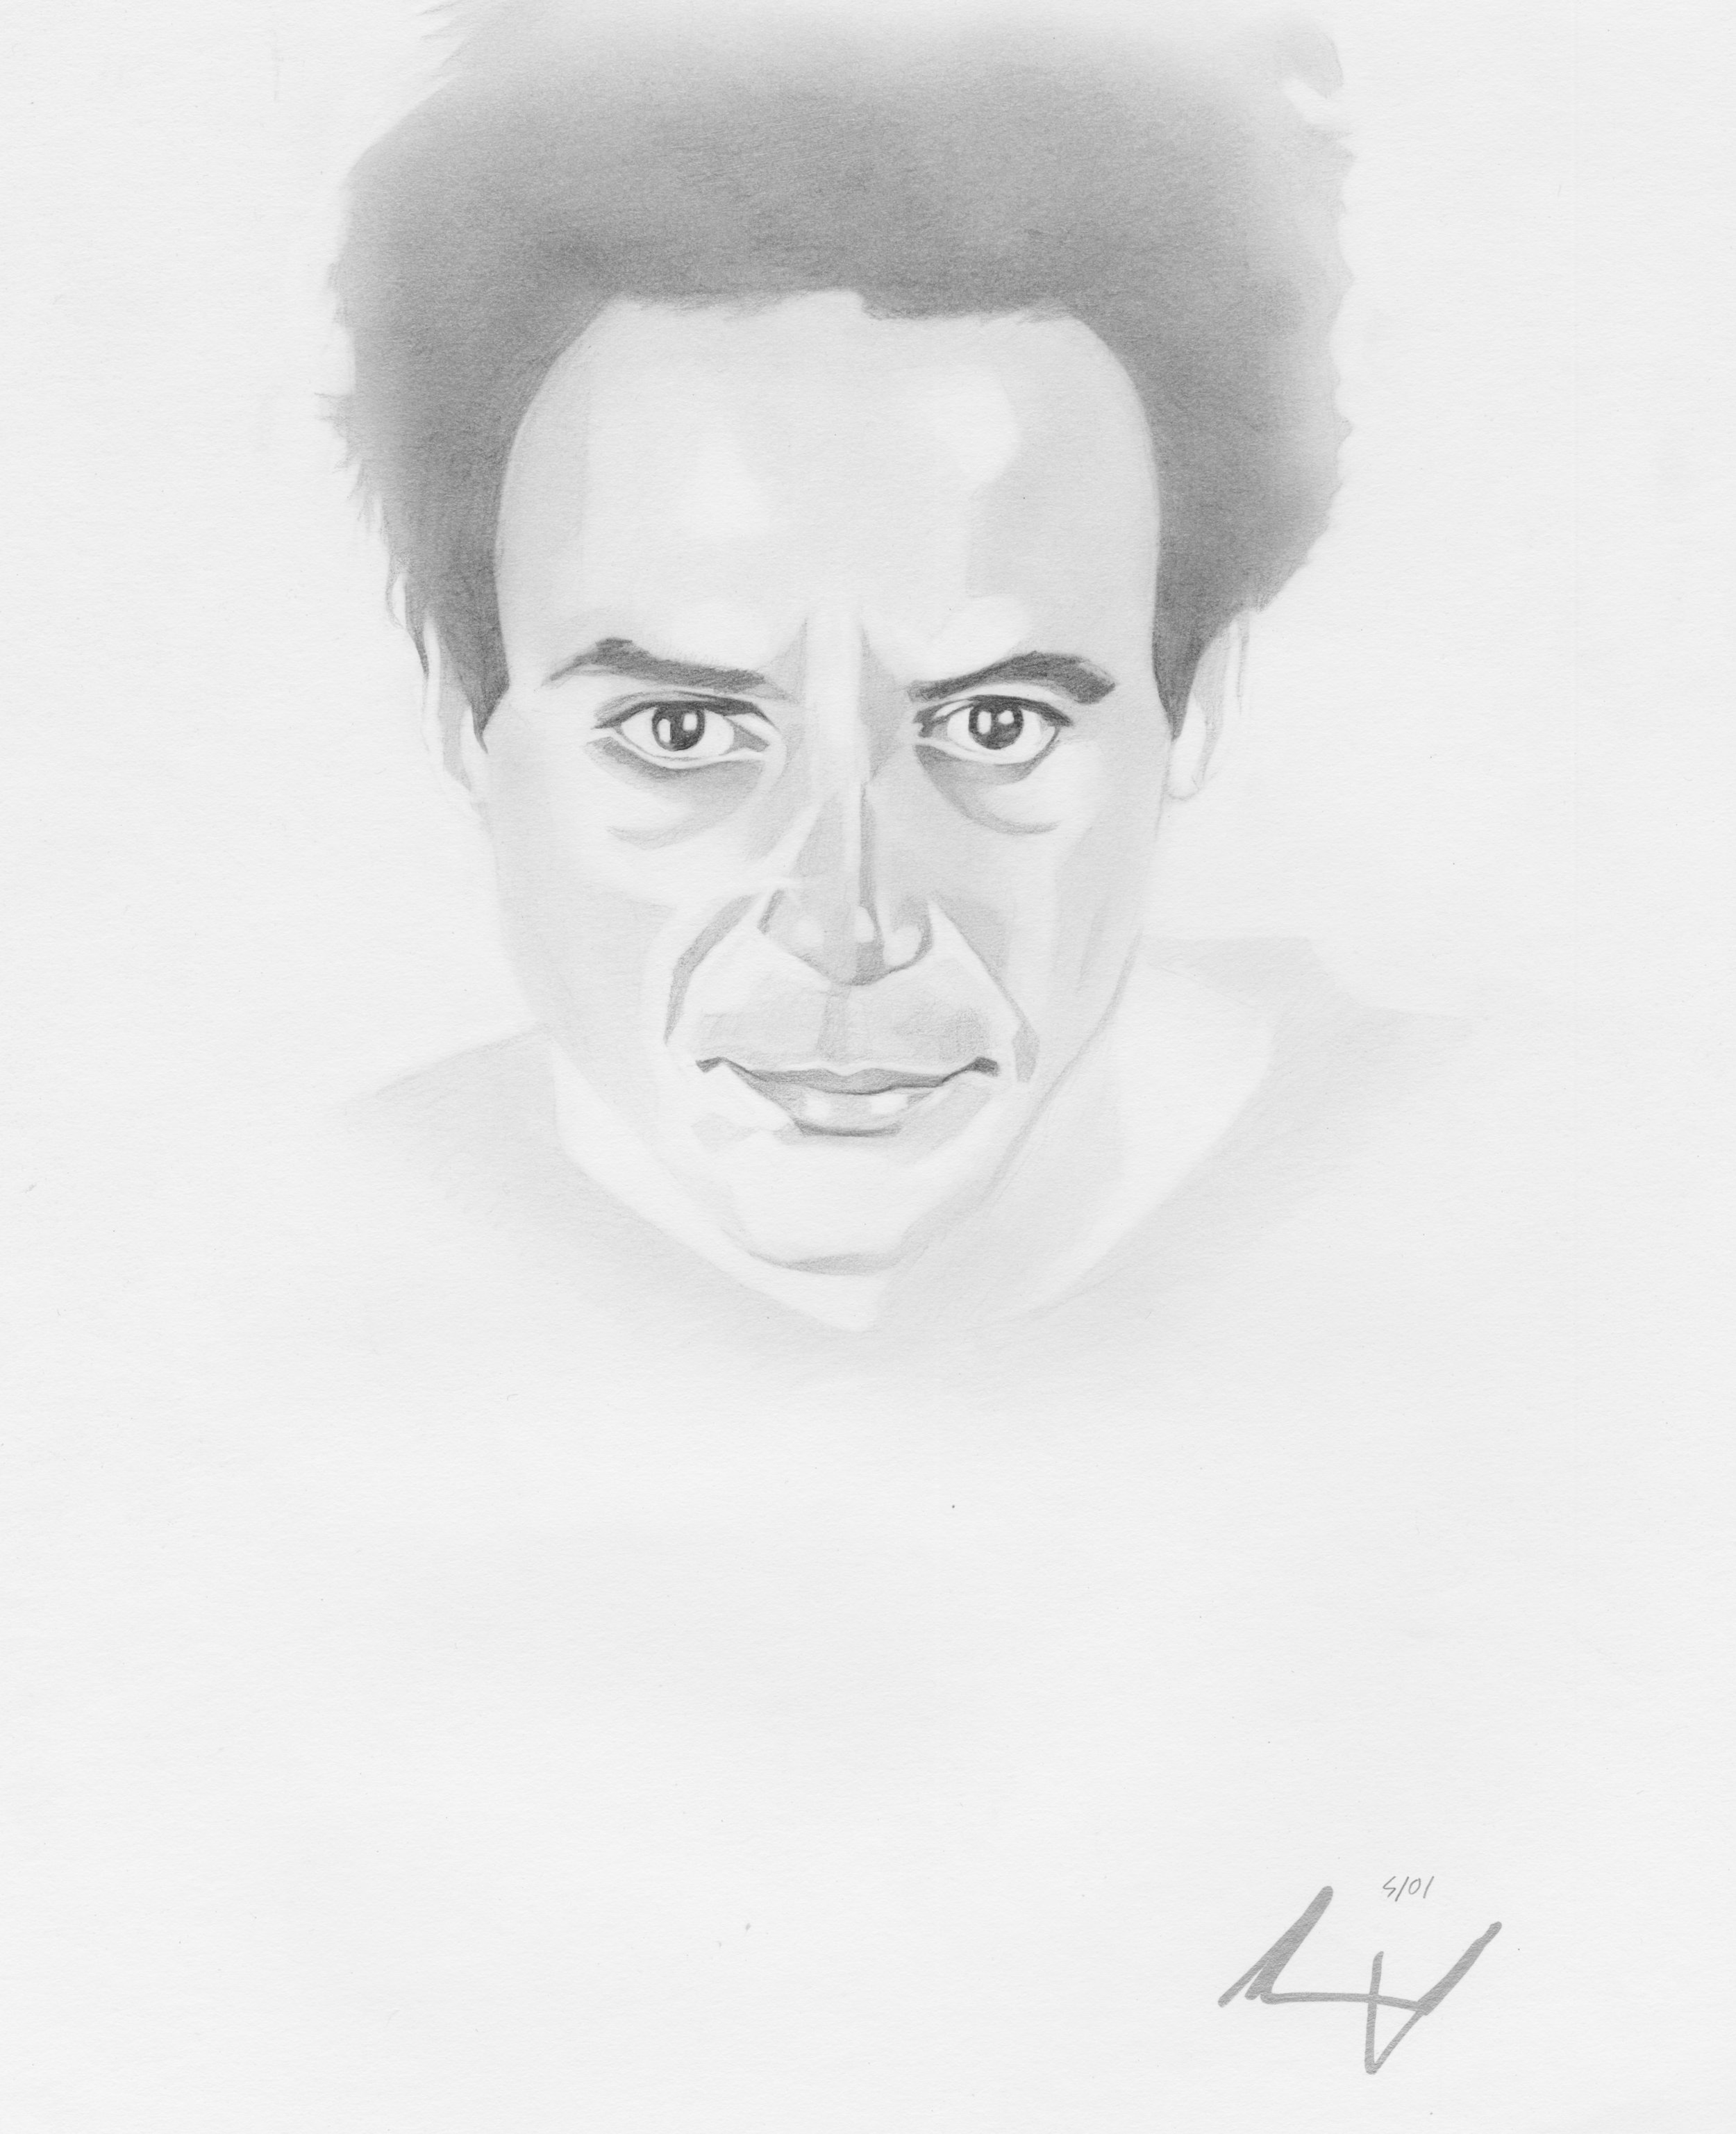 2001-04 Robert Downey Jr-.jpg